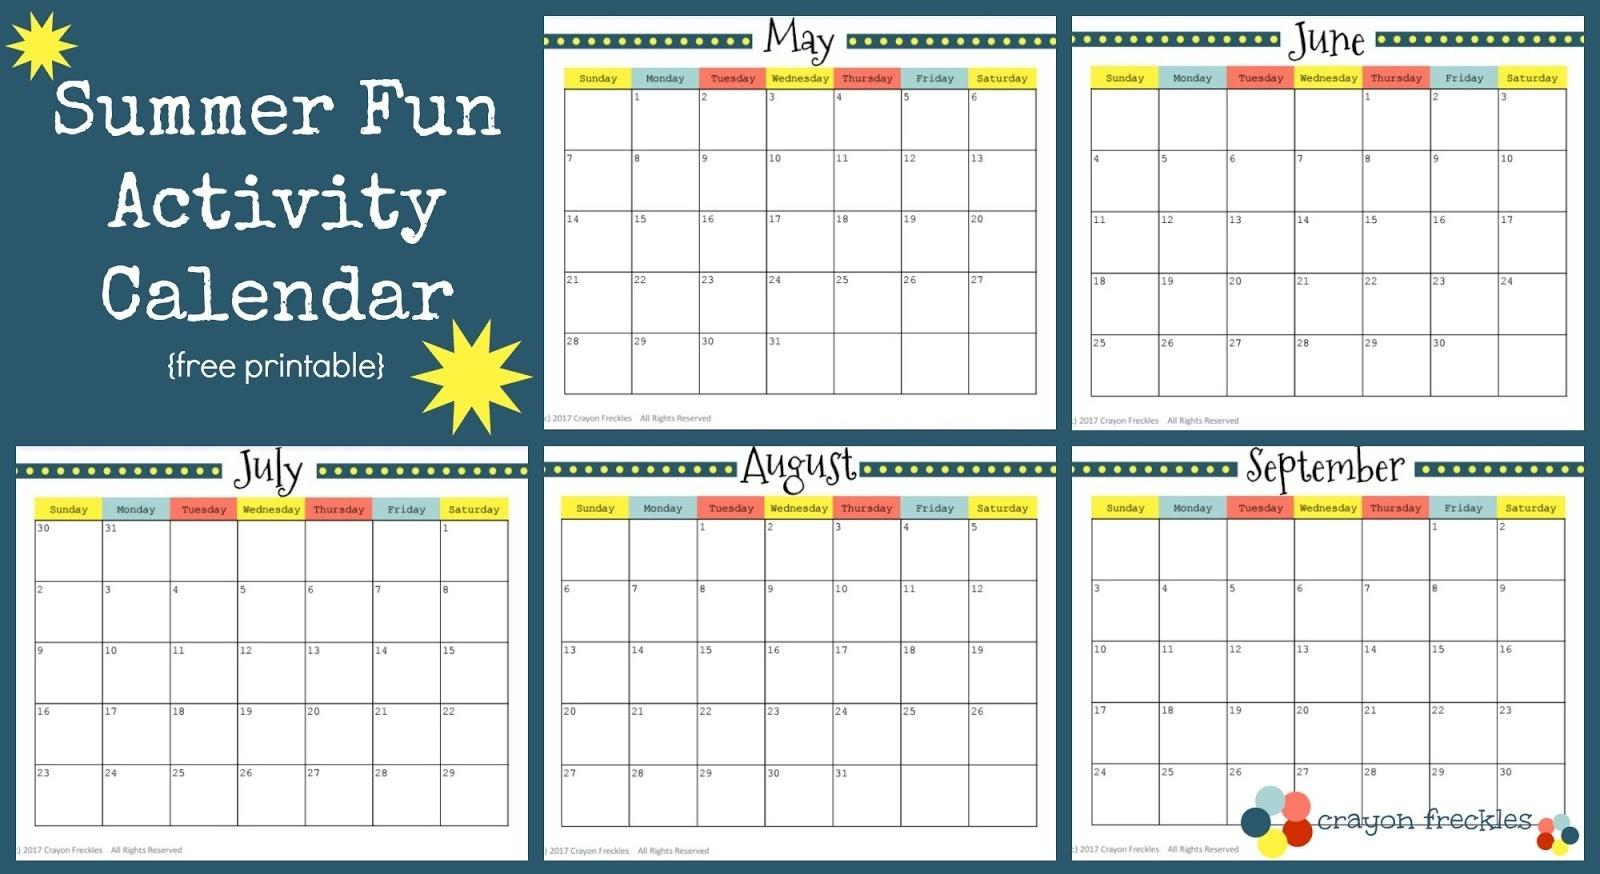 Crayon Freckles: 25 Summer Activities And Free Printable Calendar